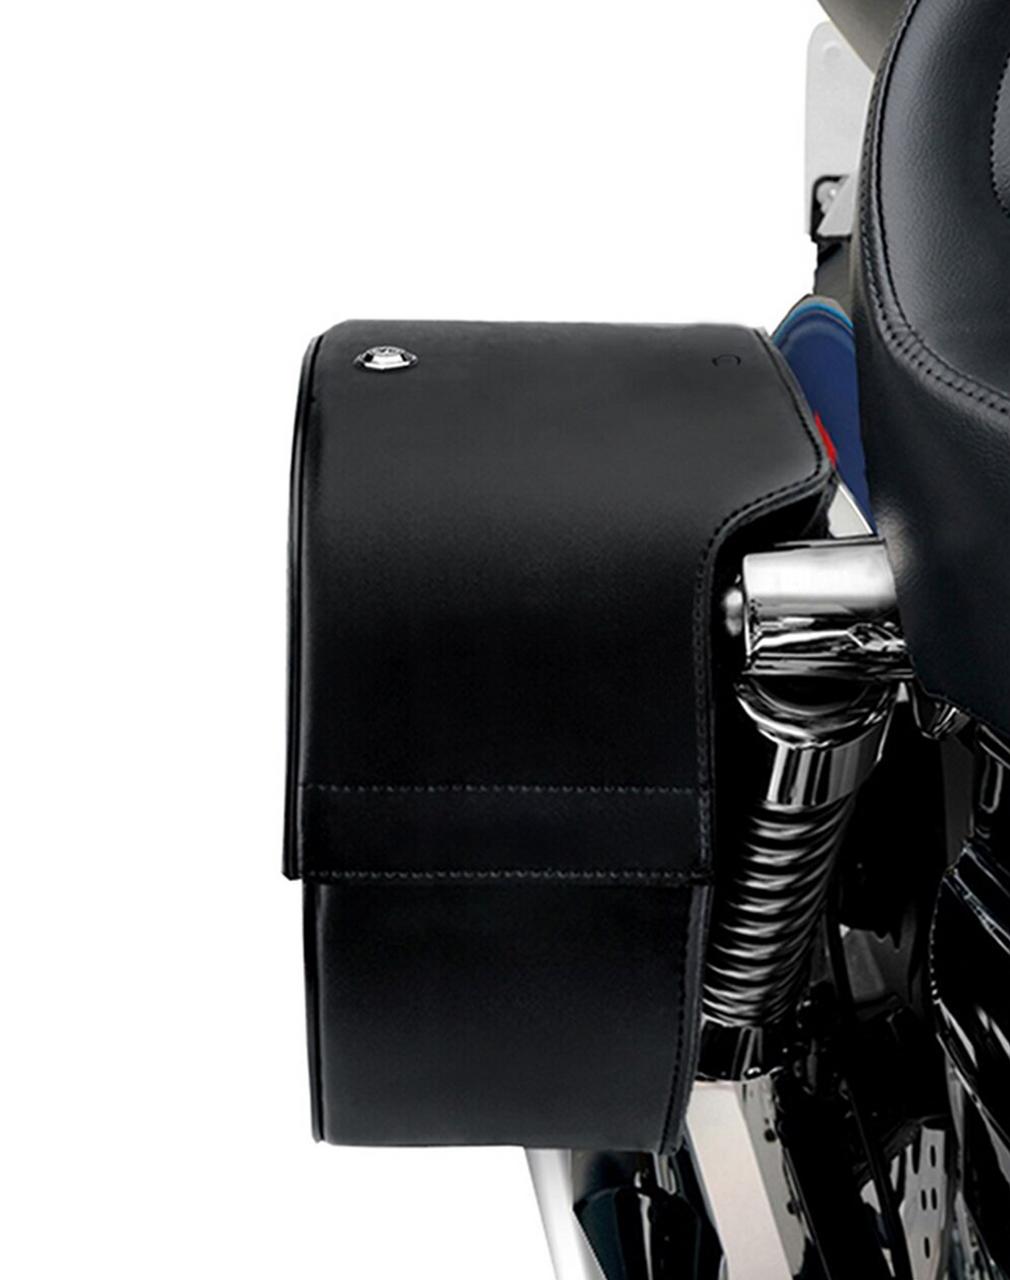 Honda 750 Shadow Phantom Large Shock Cutout Warrior Slanted Motorcycle Saddlebags shock cutout view